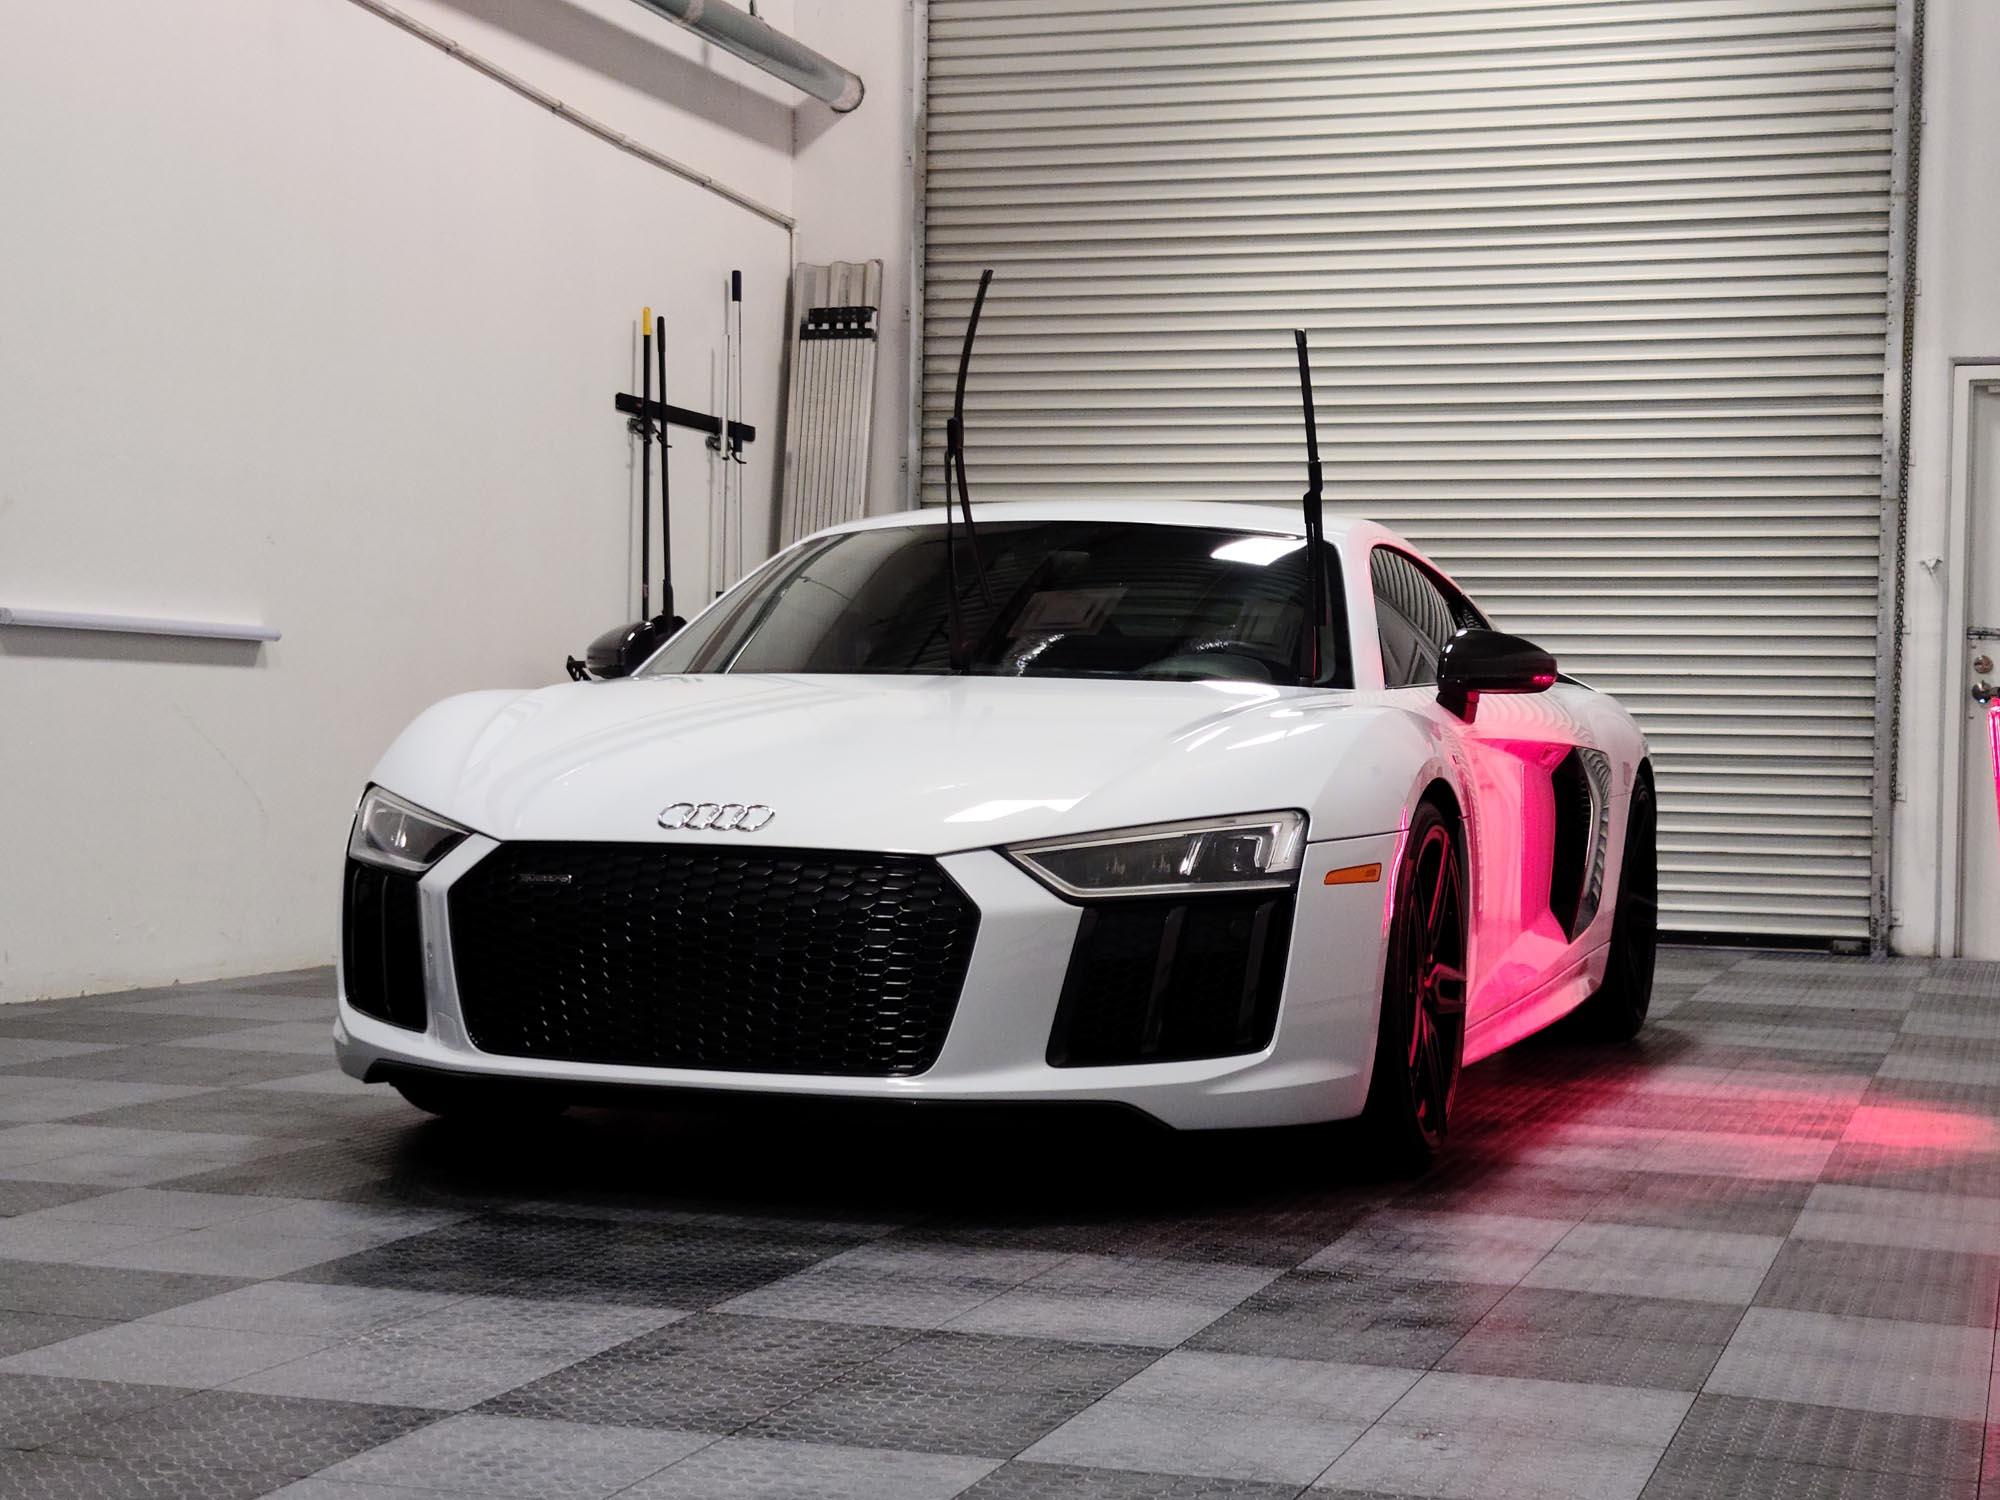 https://mk0flawlessimagps15a.kinstacdn.com/wp-content/uploads/2020/11/Audi-R8-paint-correction-11.jpg